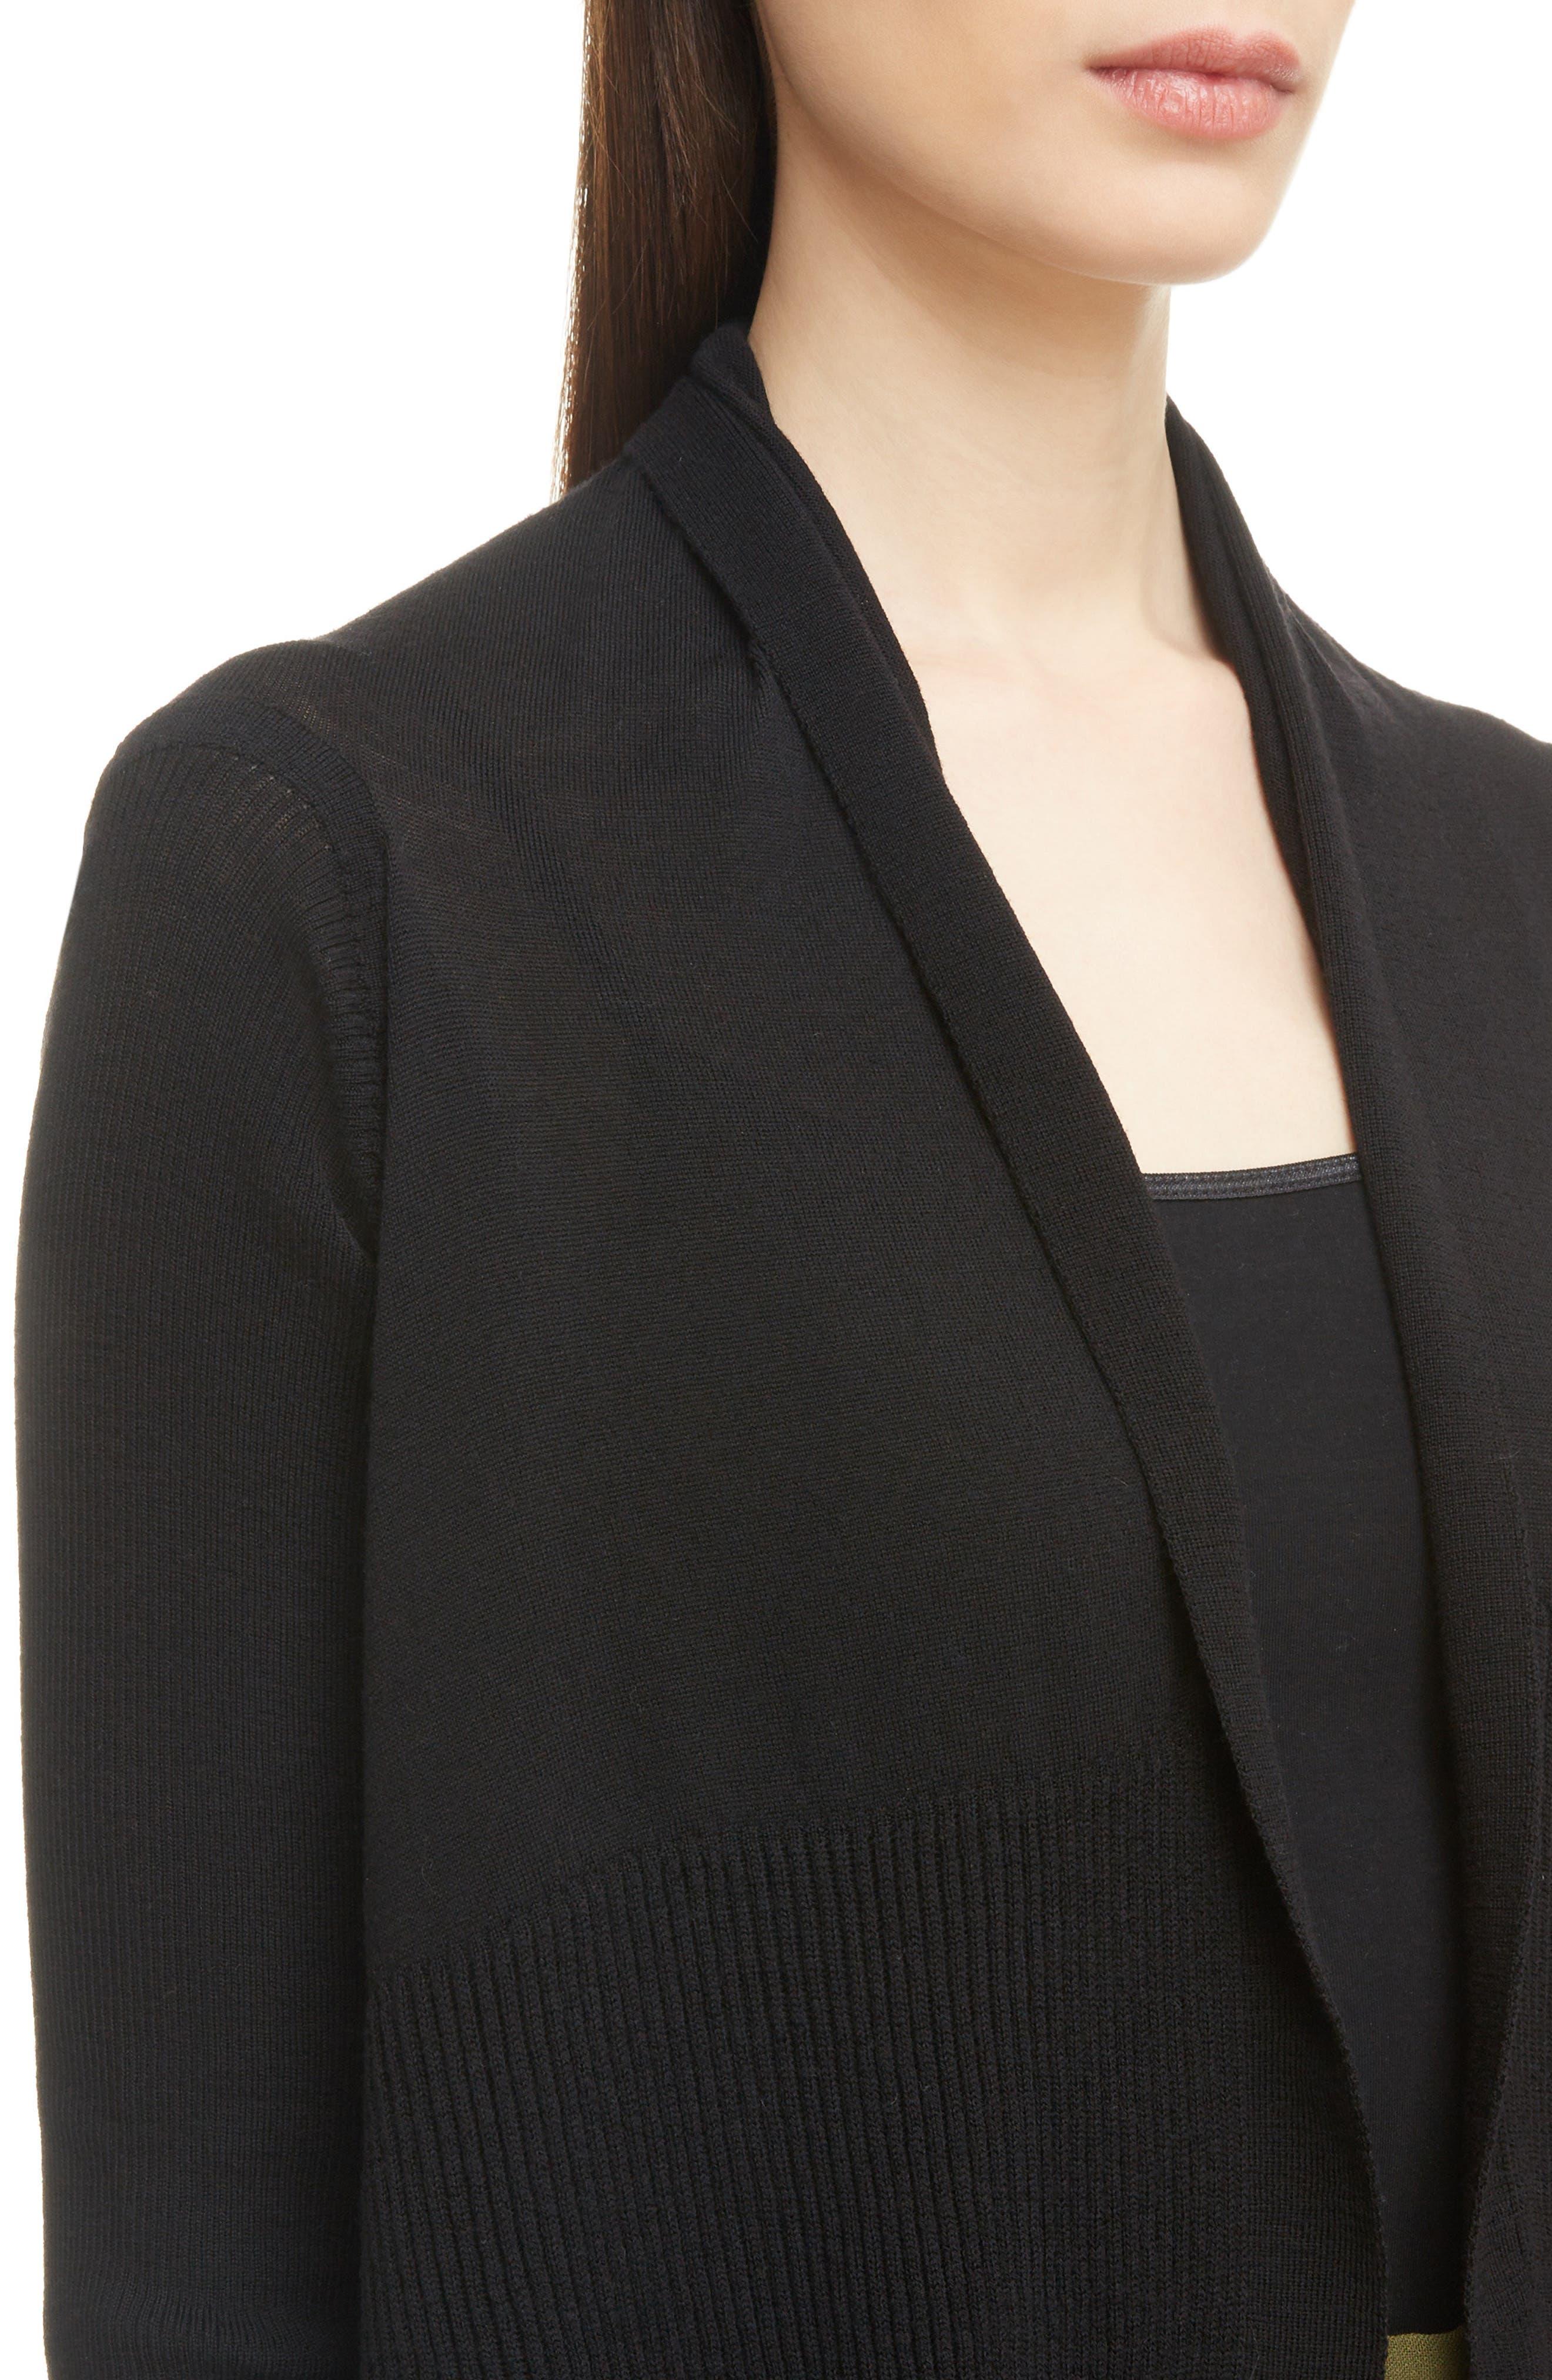 Merino Wool Drape Cardigan,                             Alternate thumbnail 4, color,                             BLACK